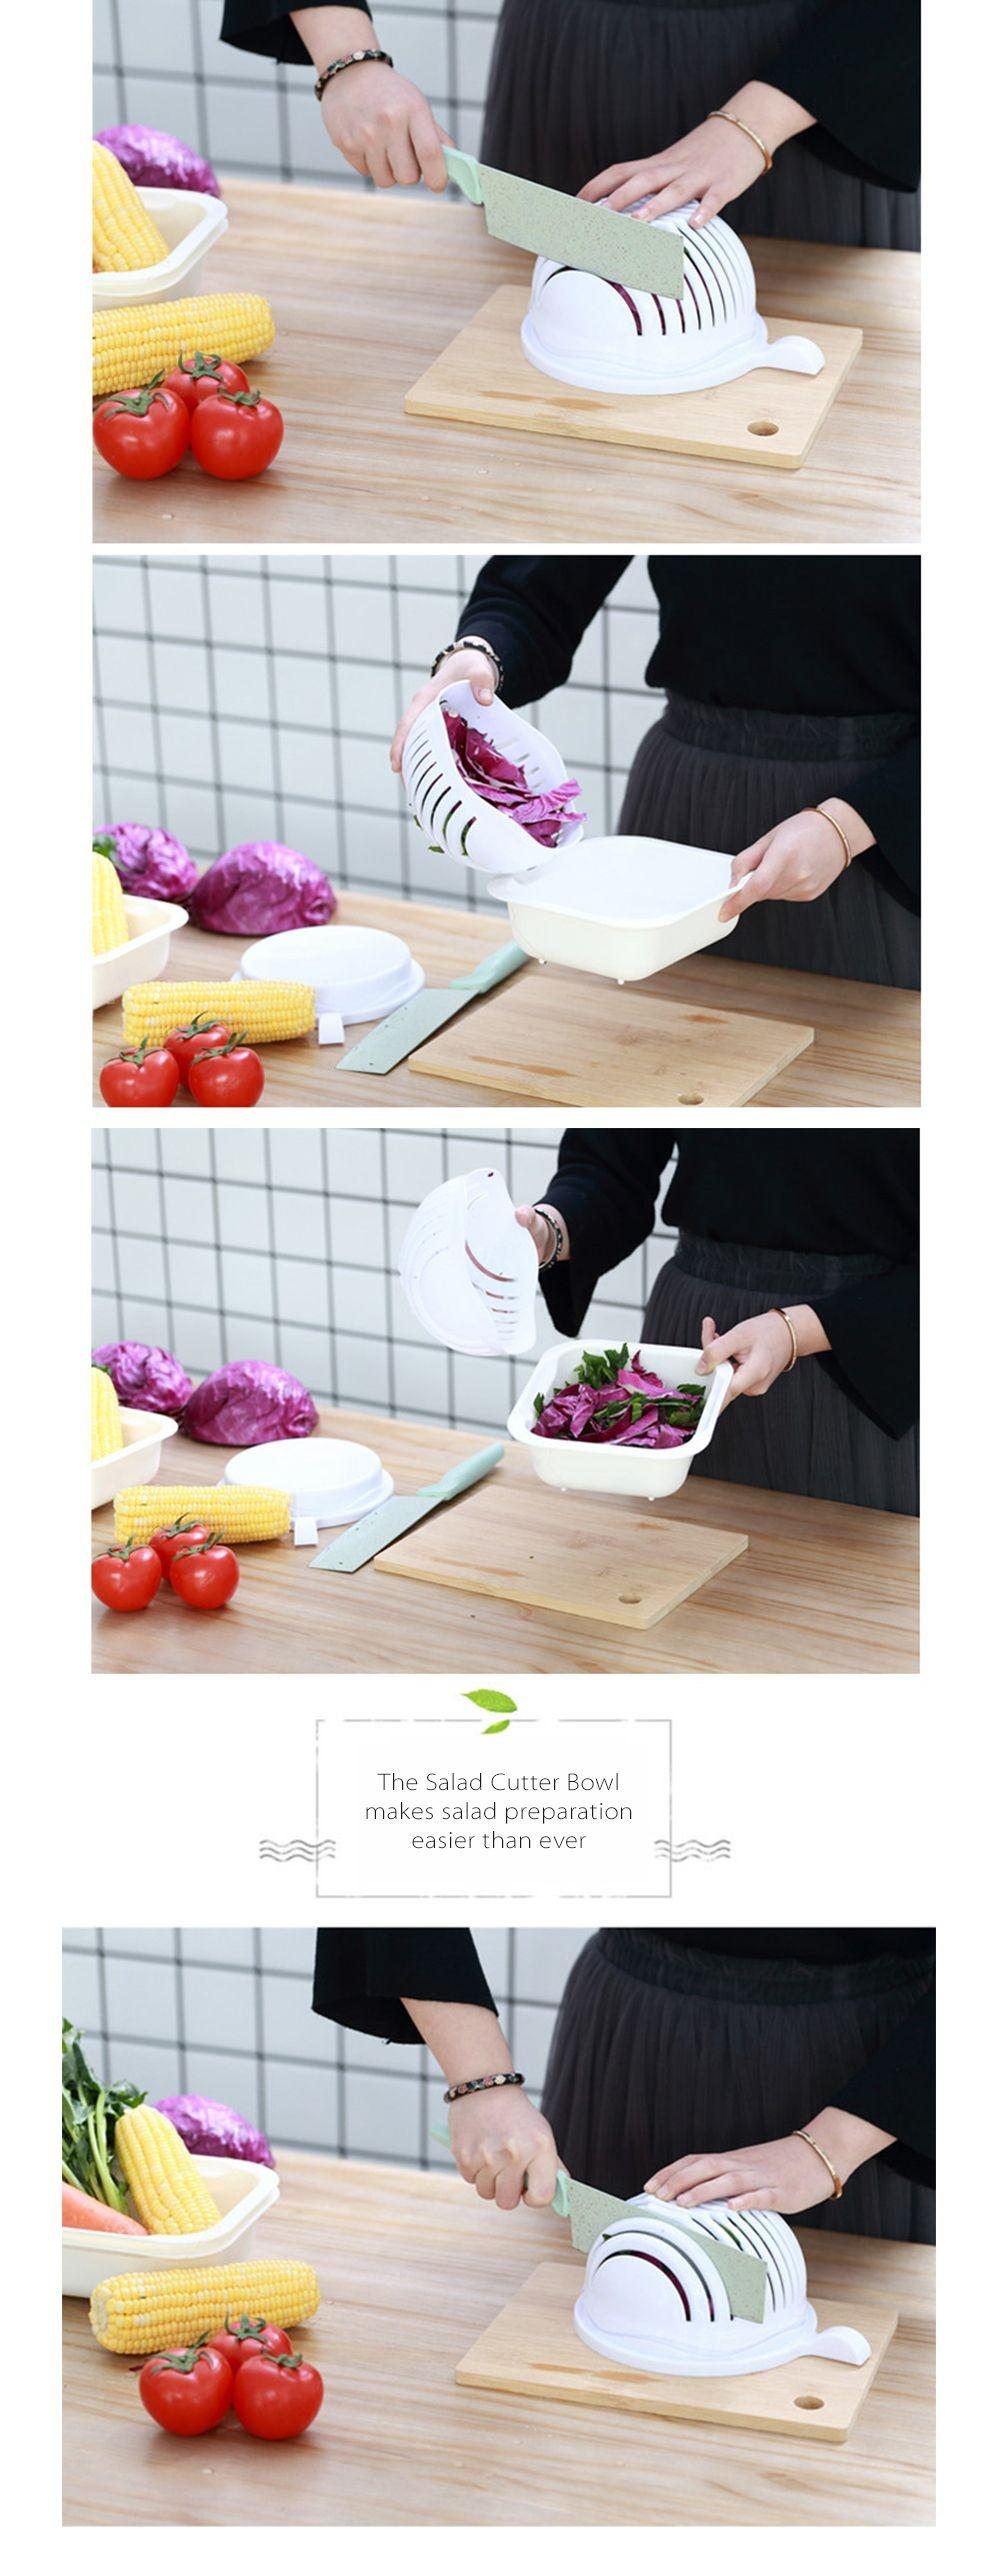 Salad Cutter Bowl 60 Second Salad Maker